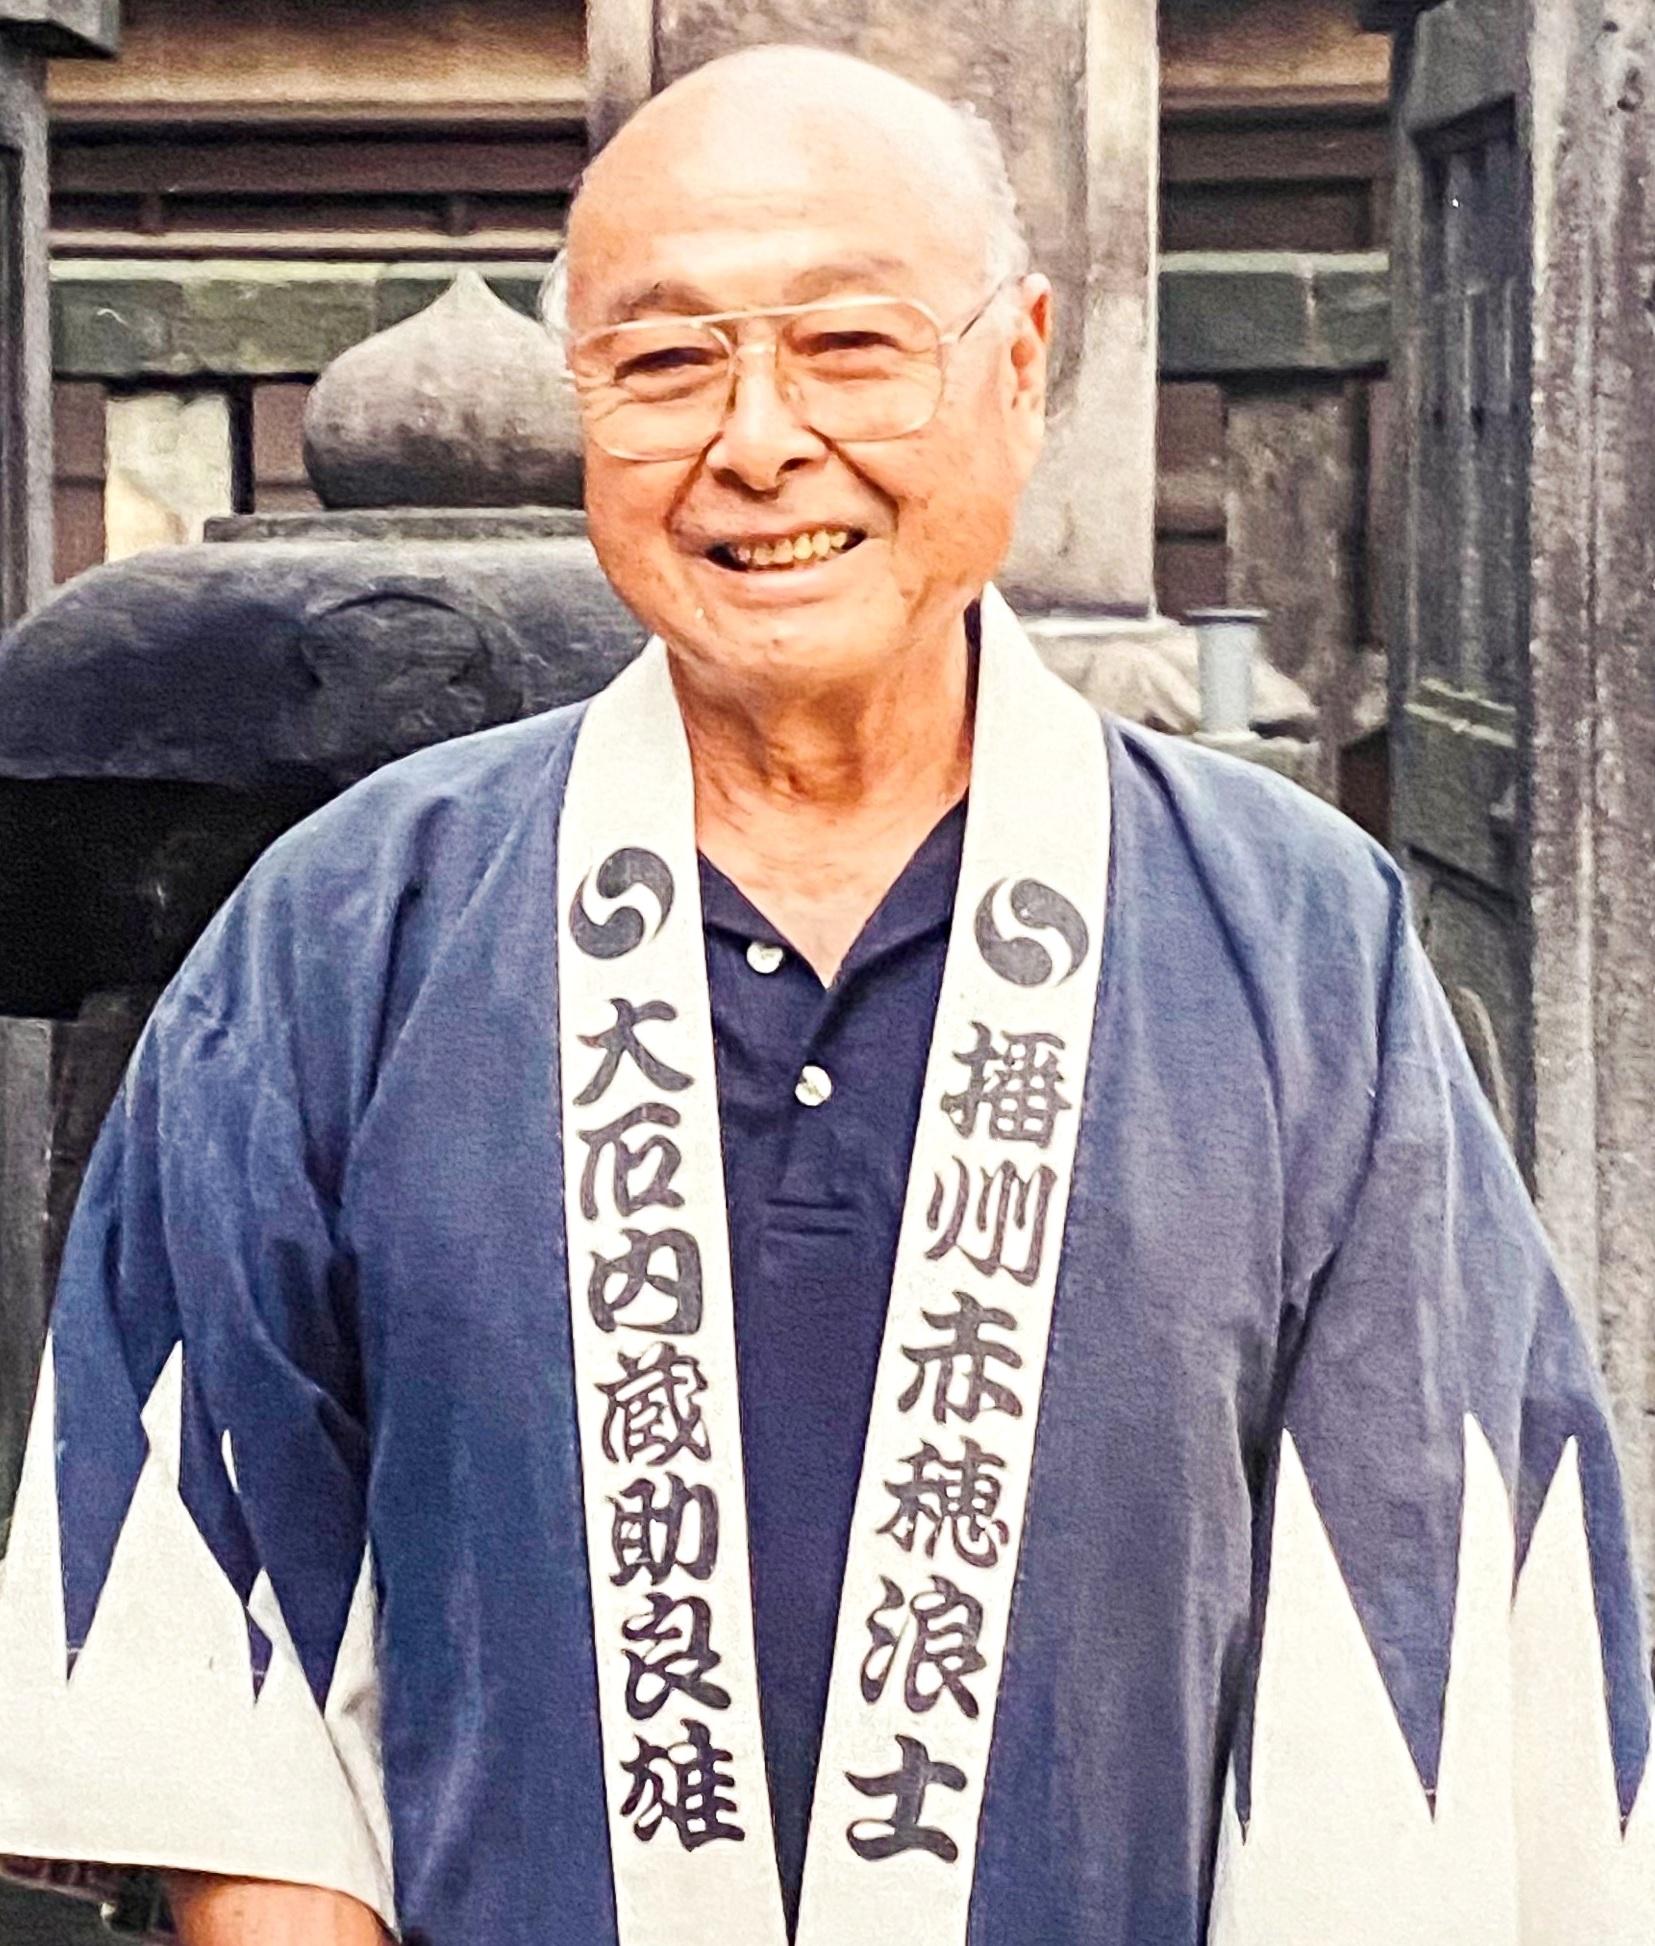 DONALD TADASHI OYA